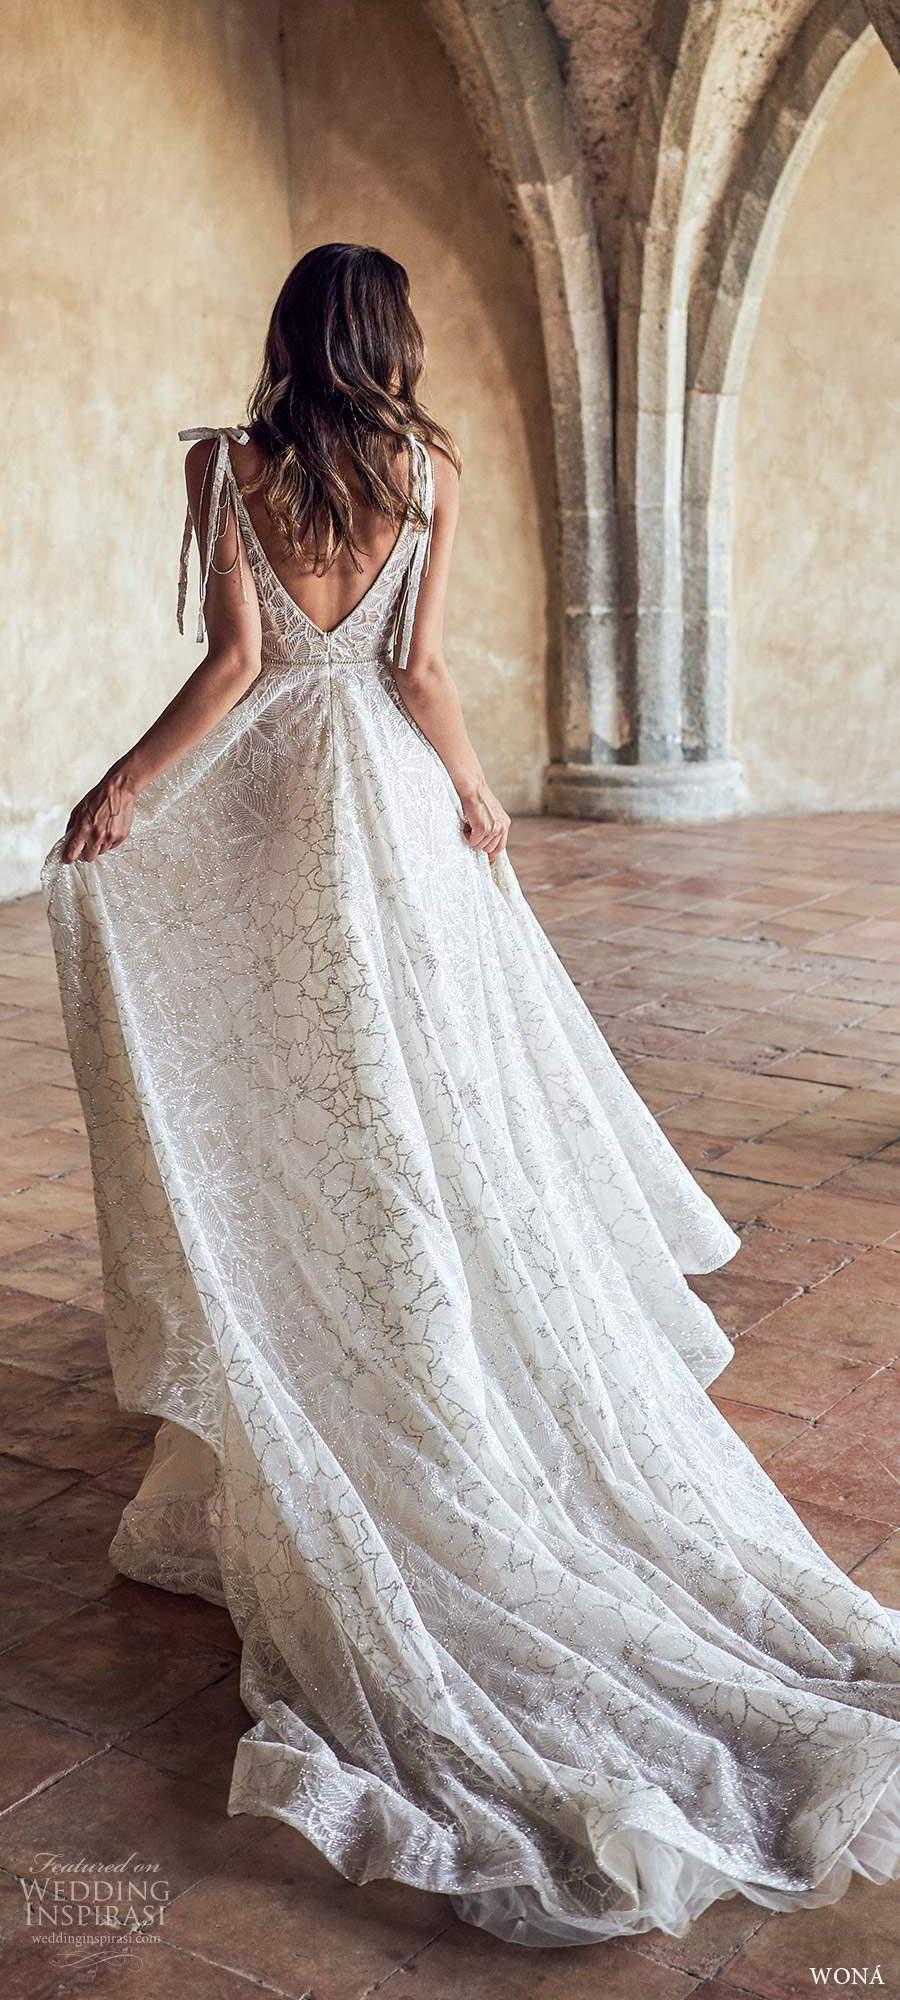 wona fall 2020 bridal sleeveless thin ribbon straps plunging v neckline fully embellished a line ball gown wedding dress v back chapel train (11) bv